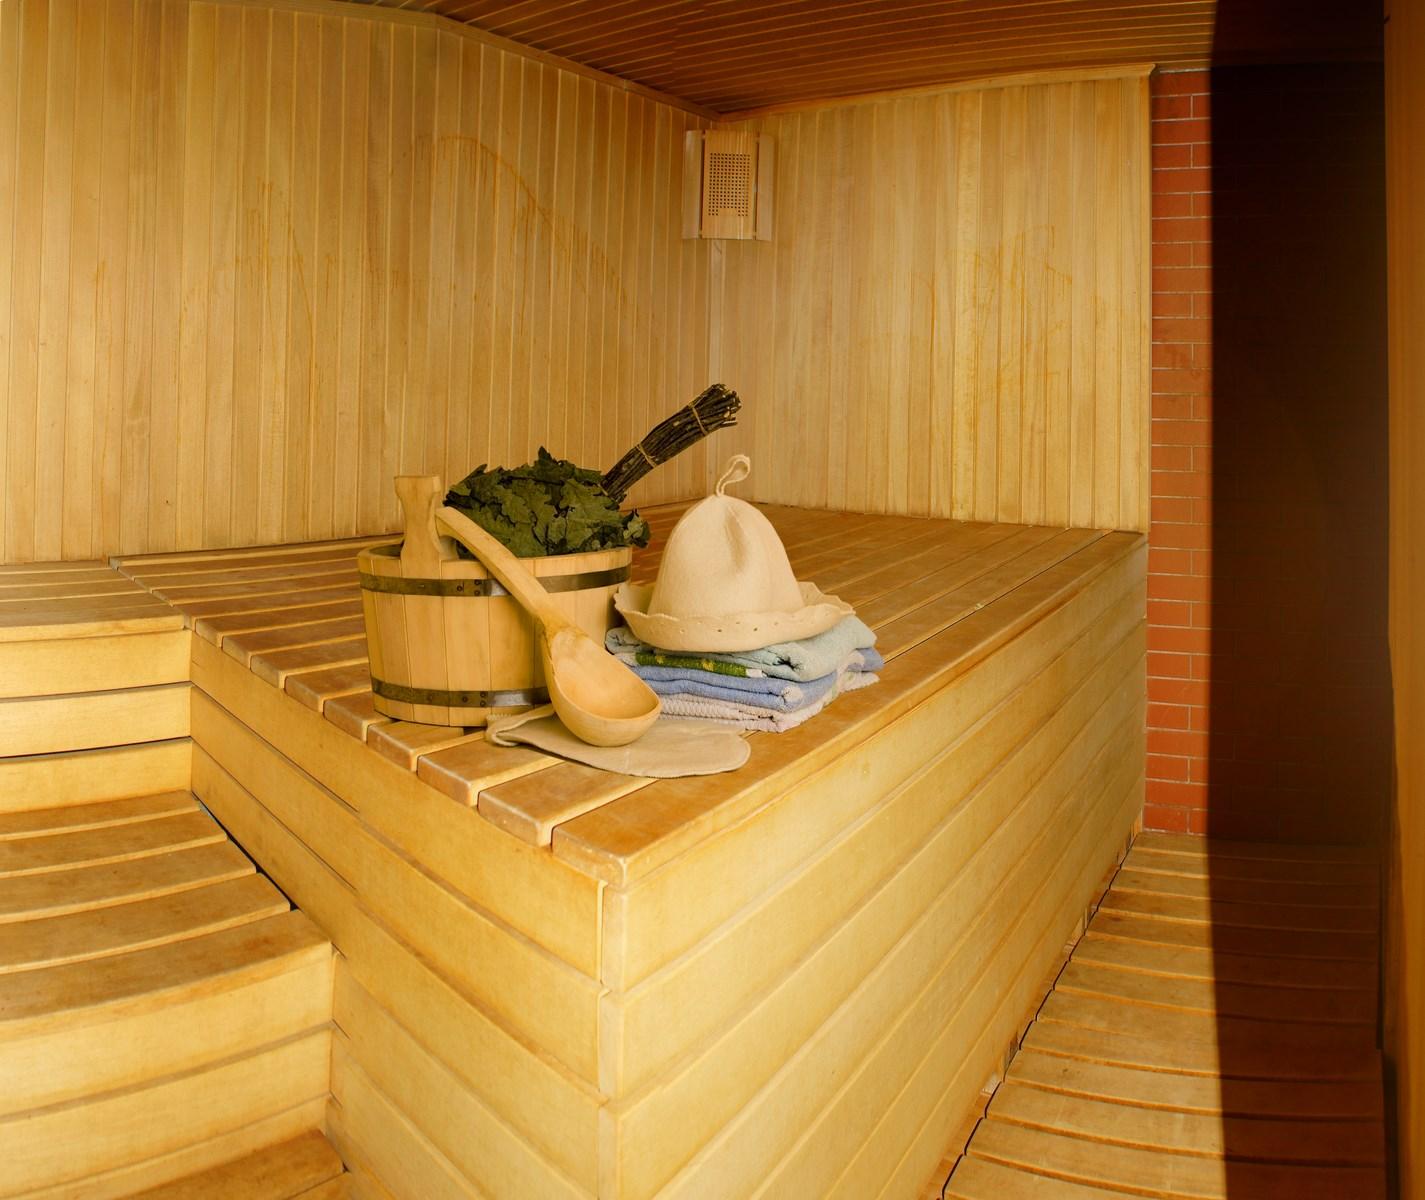 http://teh-izolyatsiya.ru/images/Sauna_3.jpg